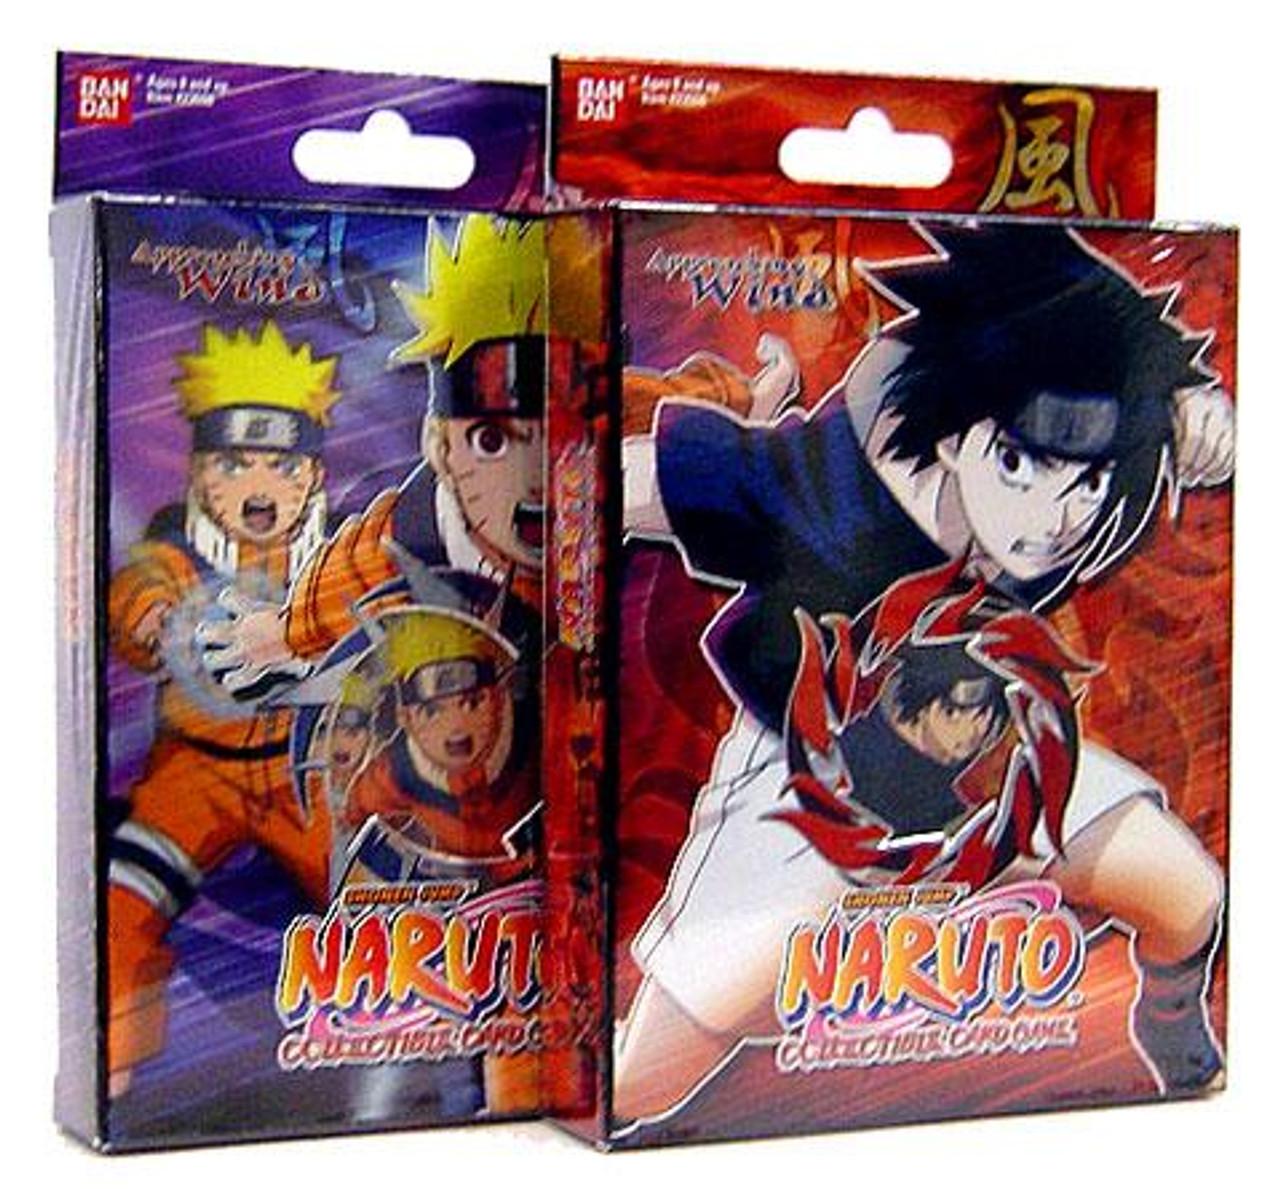 Naruto Card Game Set of Both Approaching Wind Theme Decks